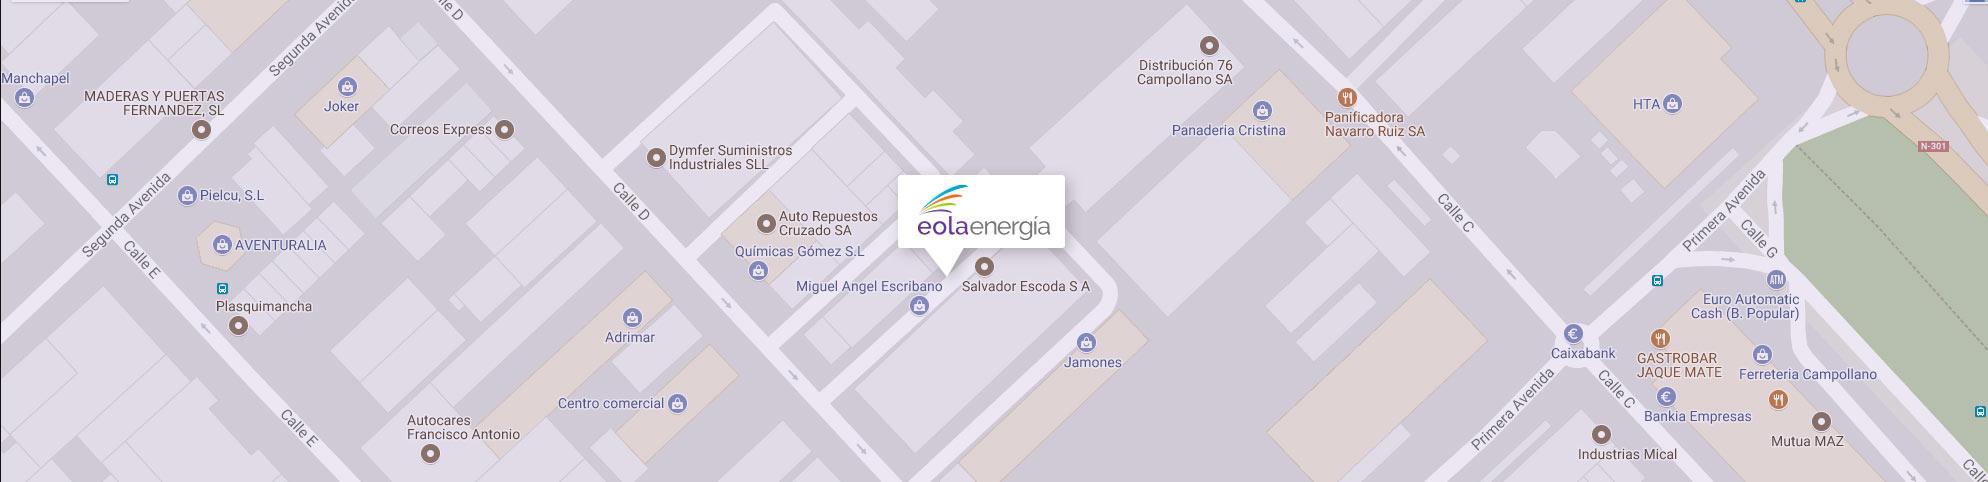 Mapa ubicación EolaEnergía